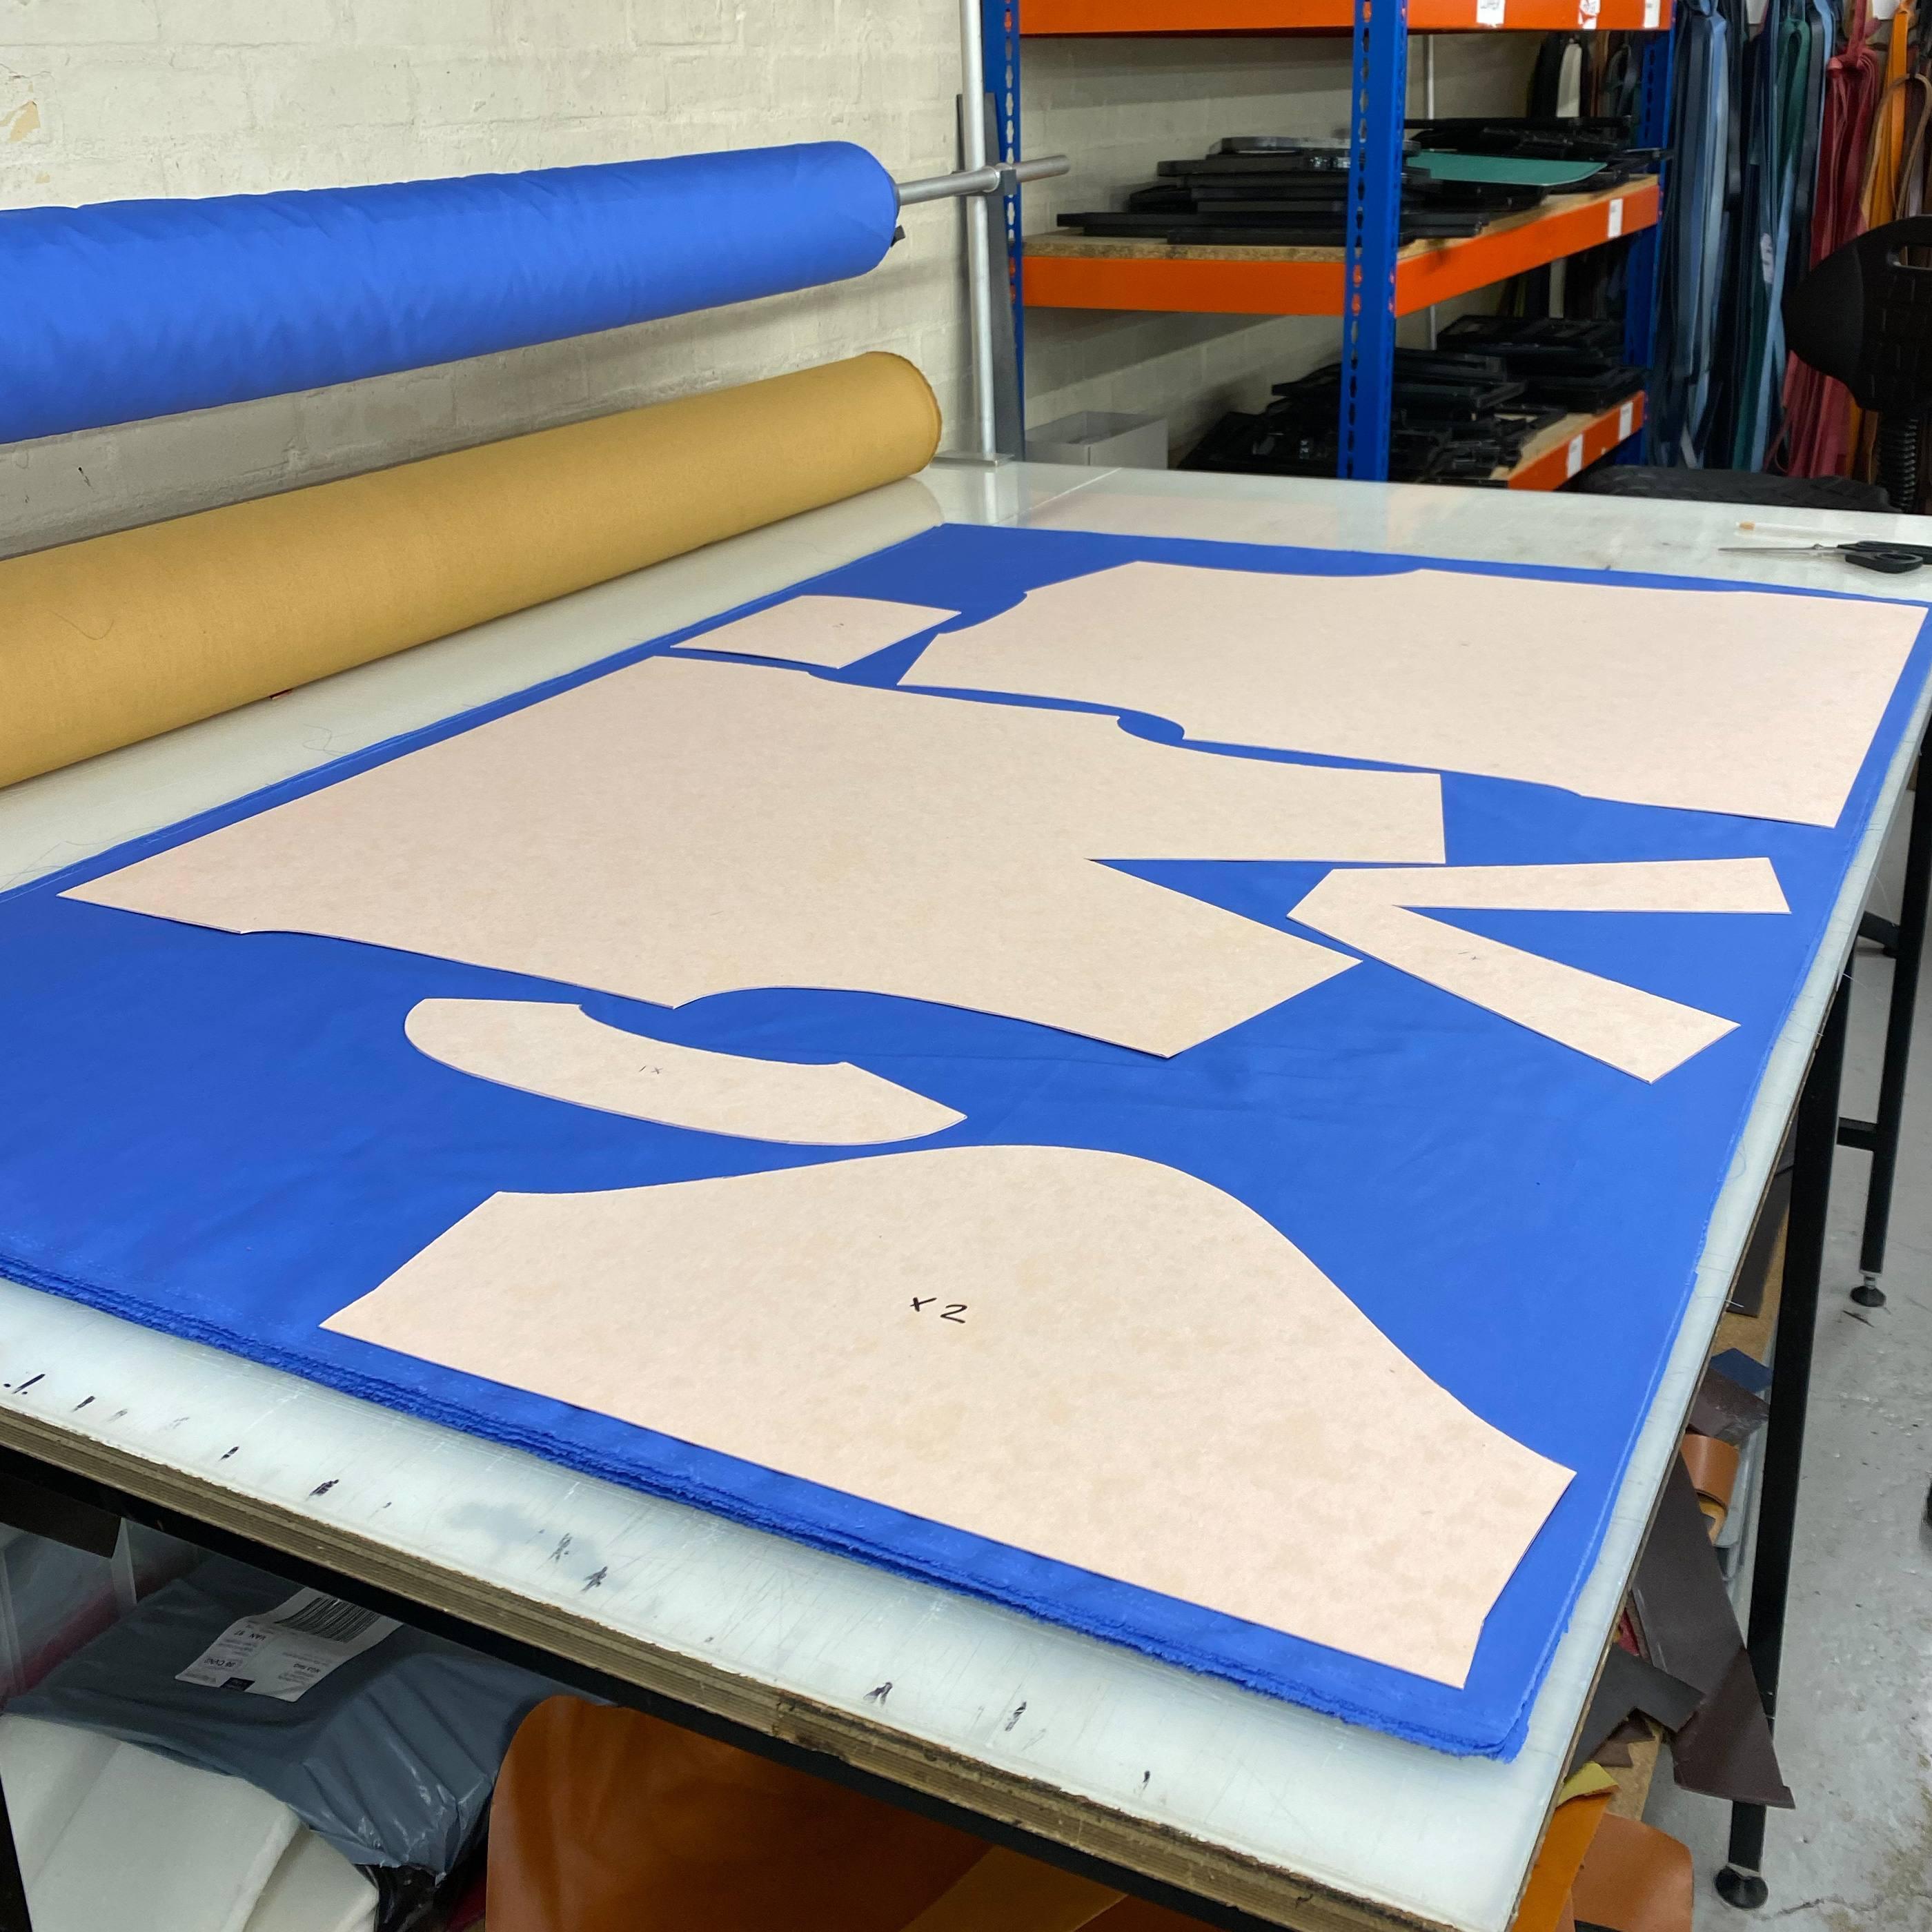 Tusting – British Makers Respond To NHS Effort